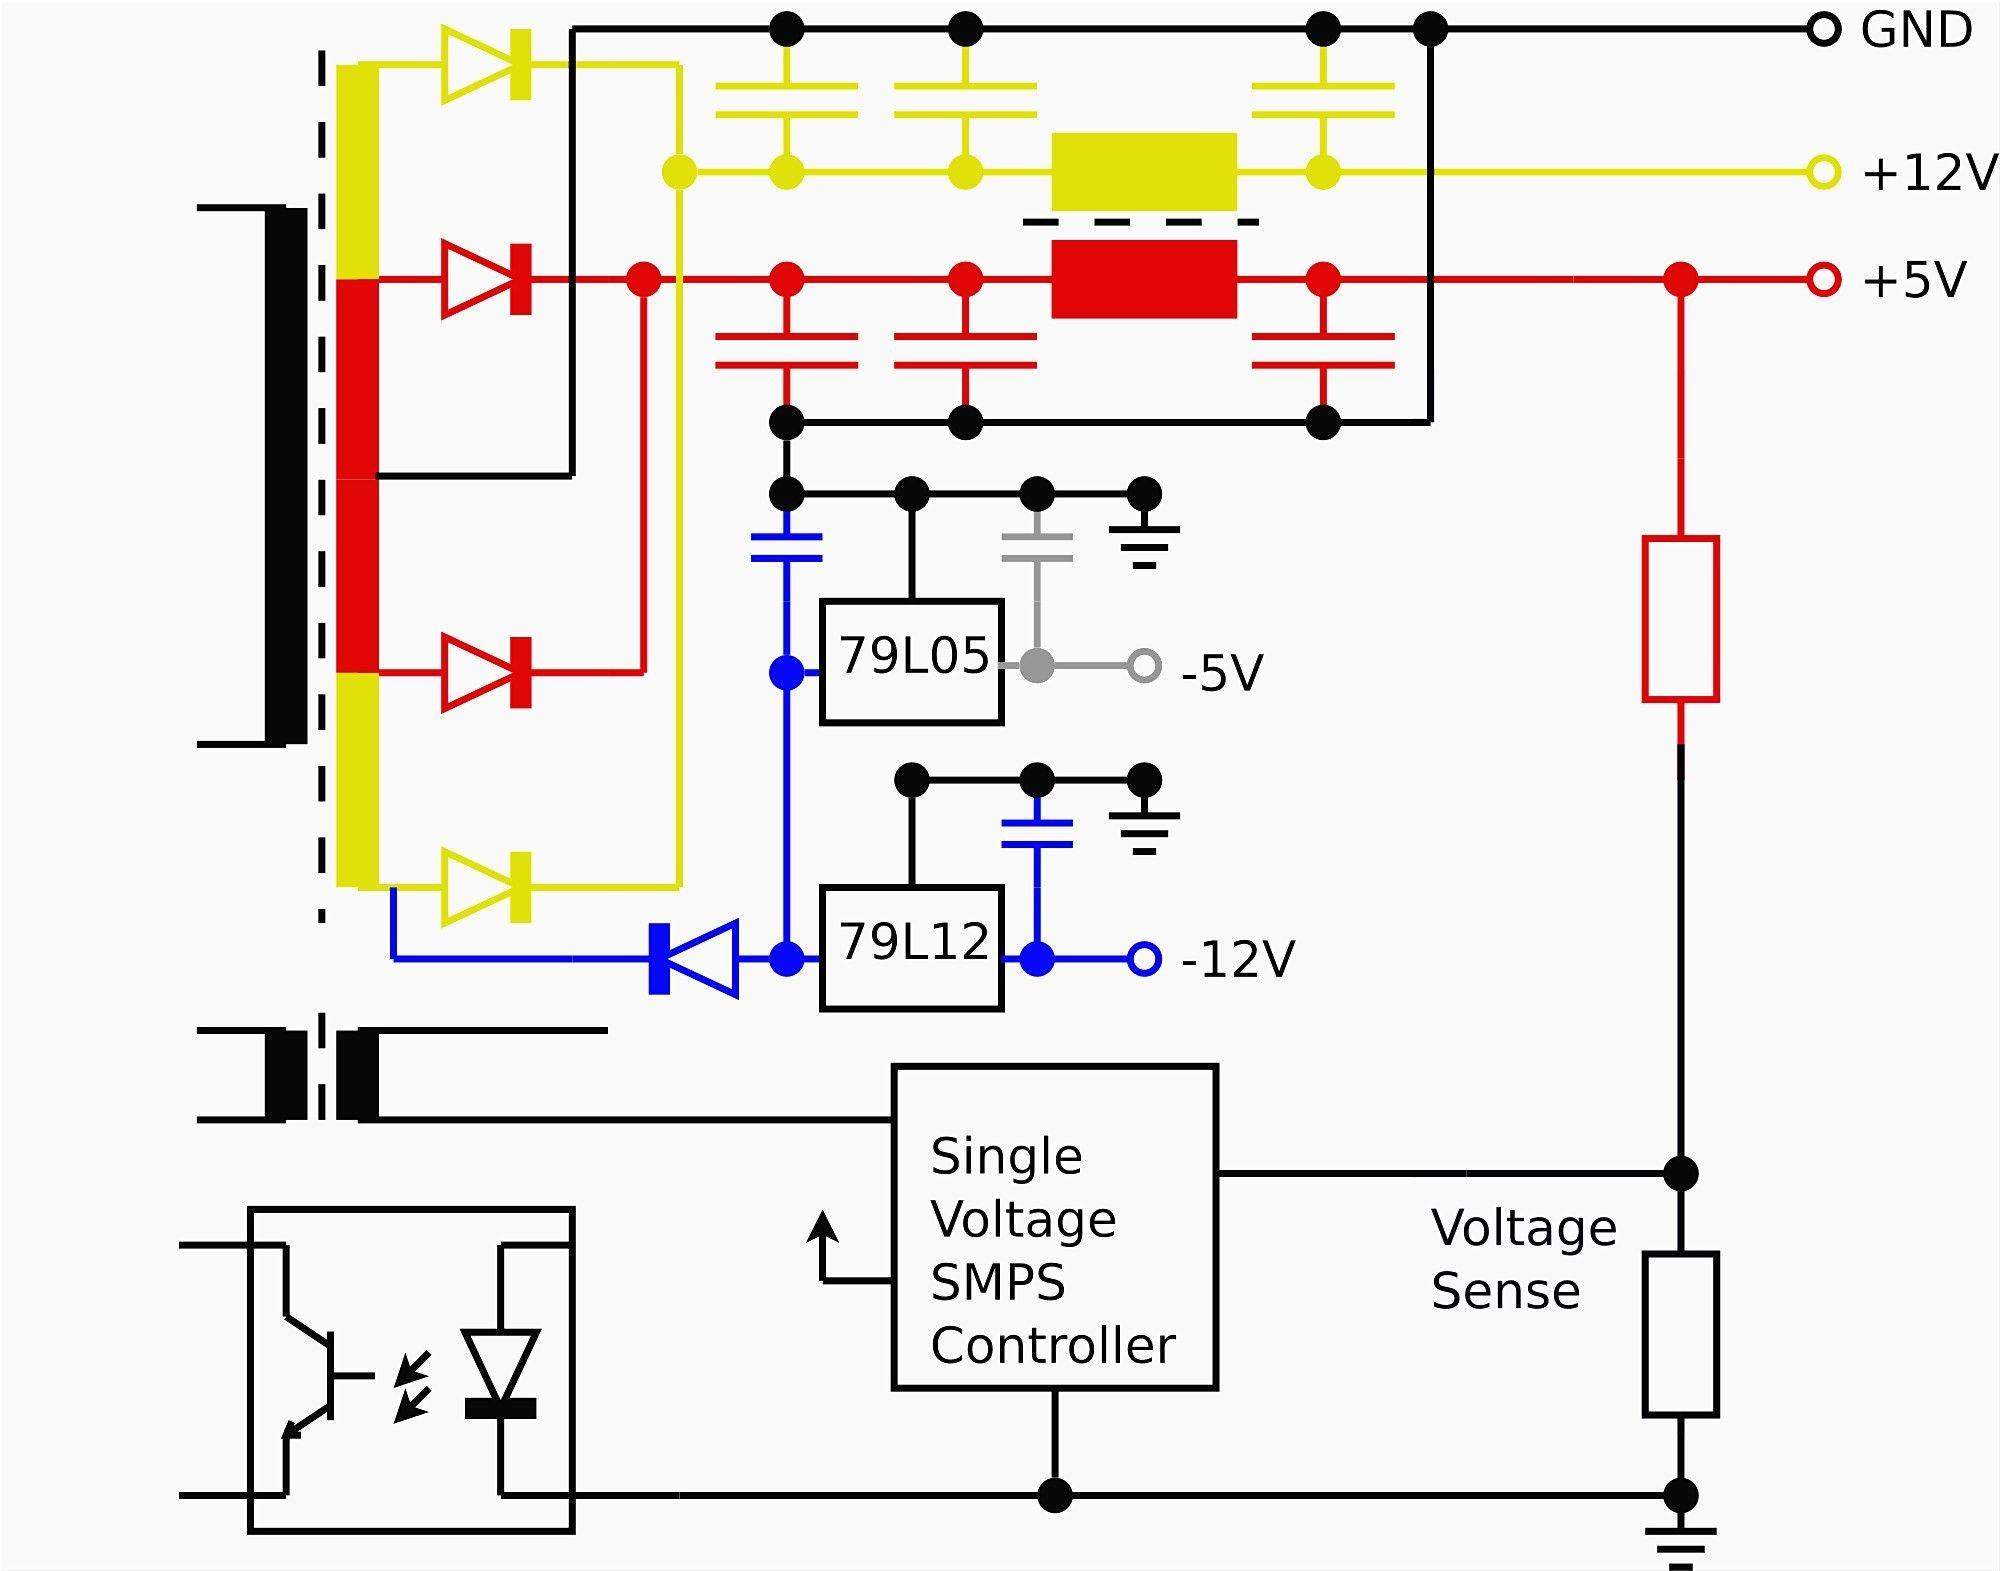 Unique Automotive Electrical Schematic Diagram Wiringdiagram Diagramming Diagramm Visuals Visualisation Grap Diagram Transformer Wiring Baseboard Heater